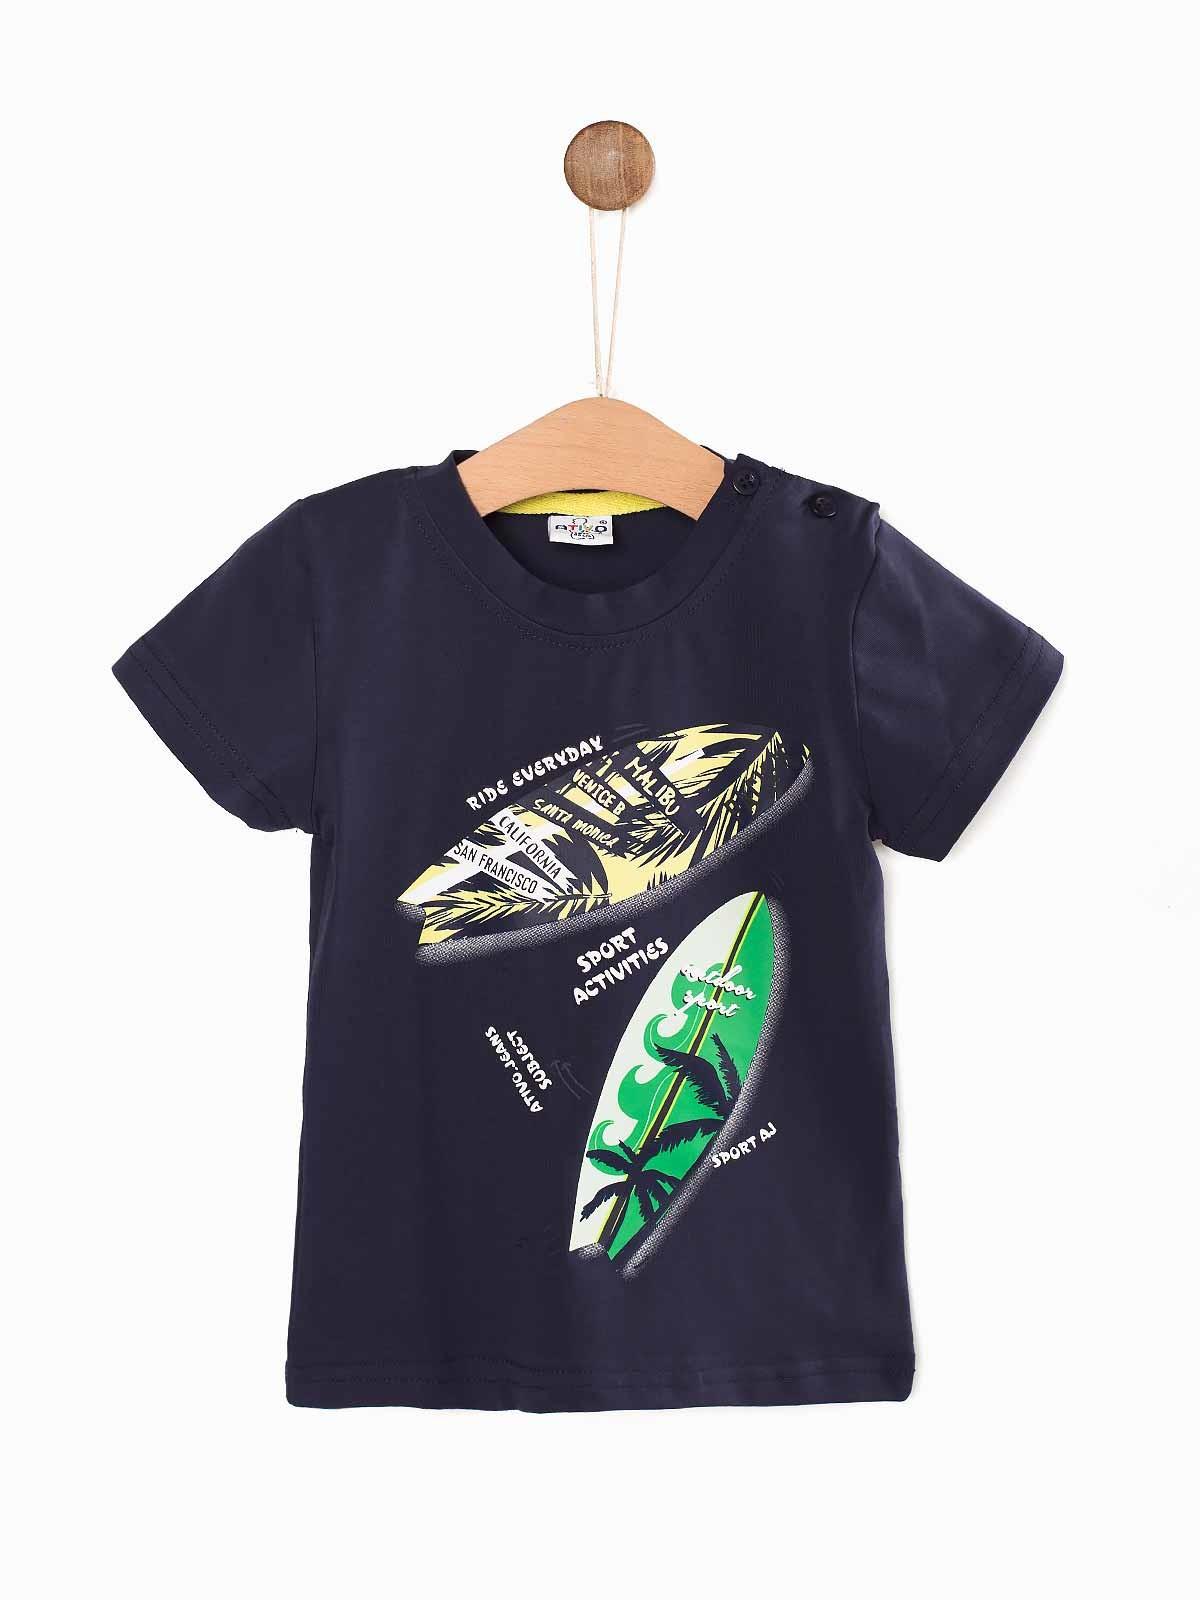 T-shirt bebé estampada Surf